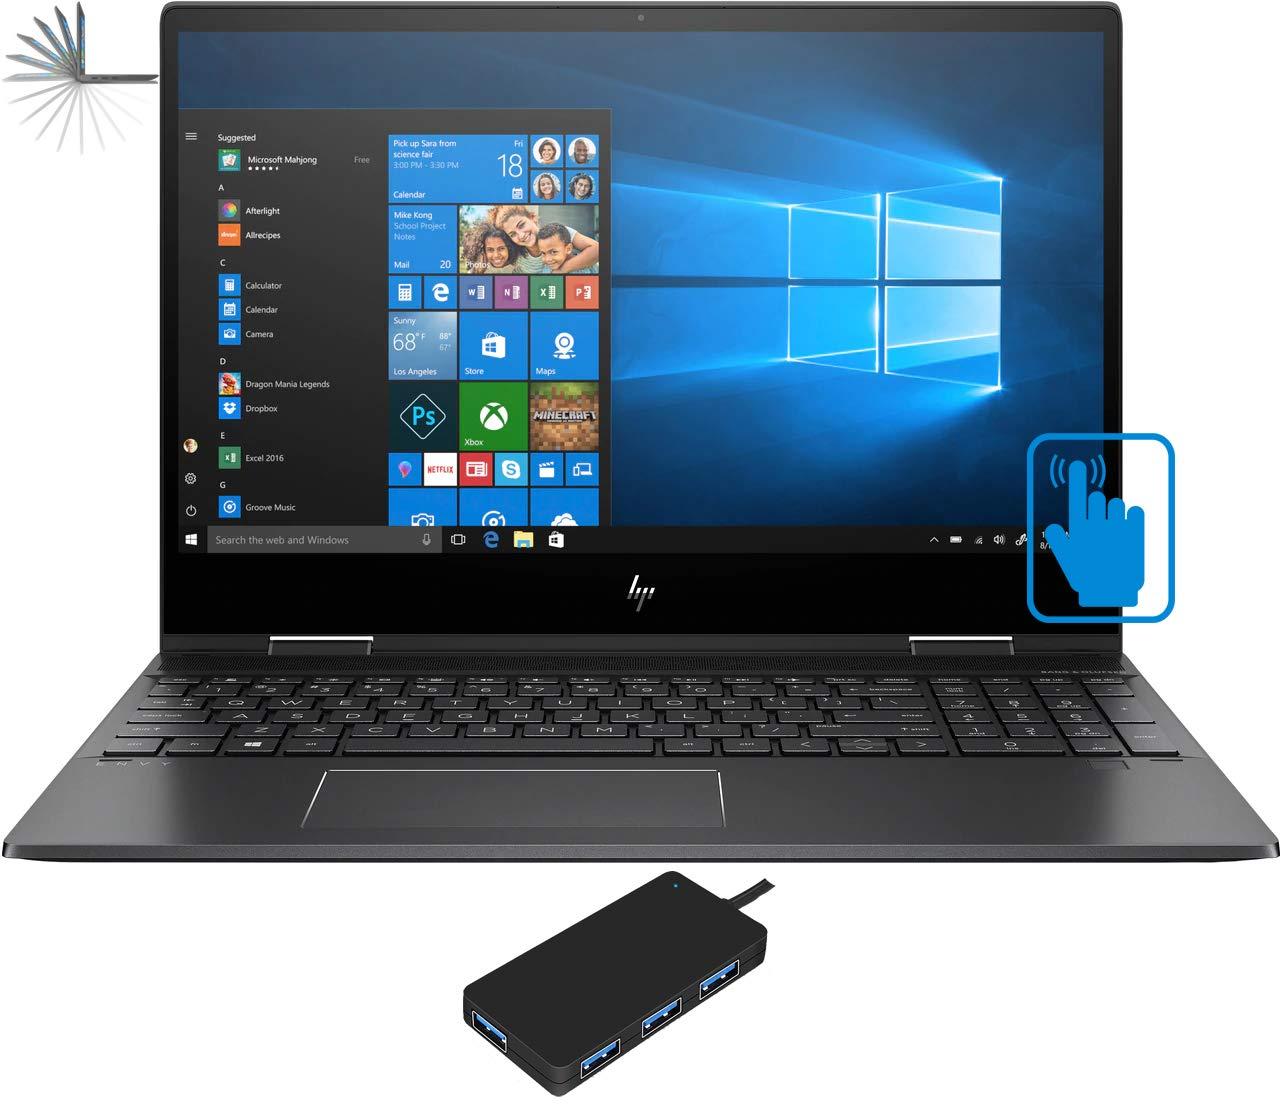 "HP Envy x360-15z Home and Business Laptop (AMD Ryzen 7 3700U 4-Core, 16GB RAM, 1TB SATA SSD, 15.6"" Touch Full HD (1920x1080), AMD Vega 10, Fingerprint, WiFi, Bluetooth, Webcam, Win 10 Pro)"